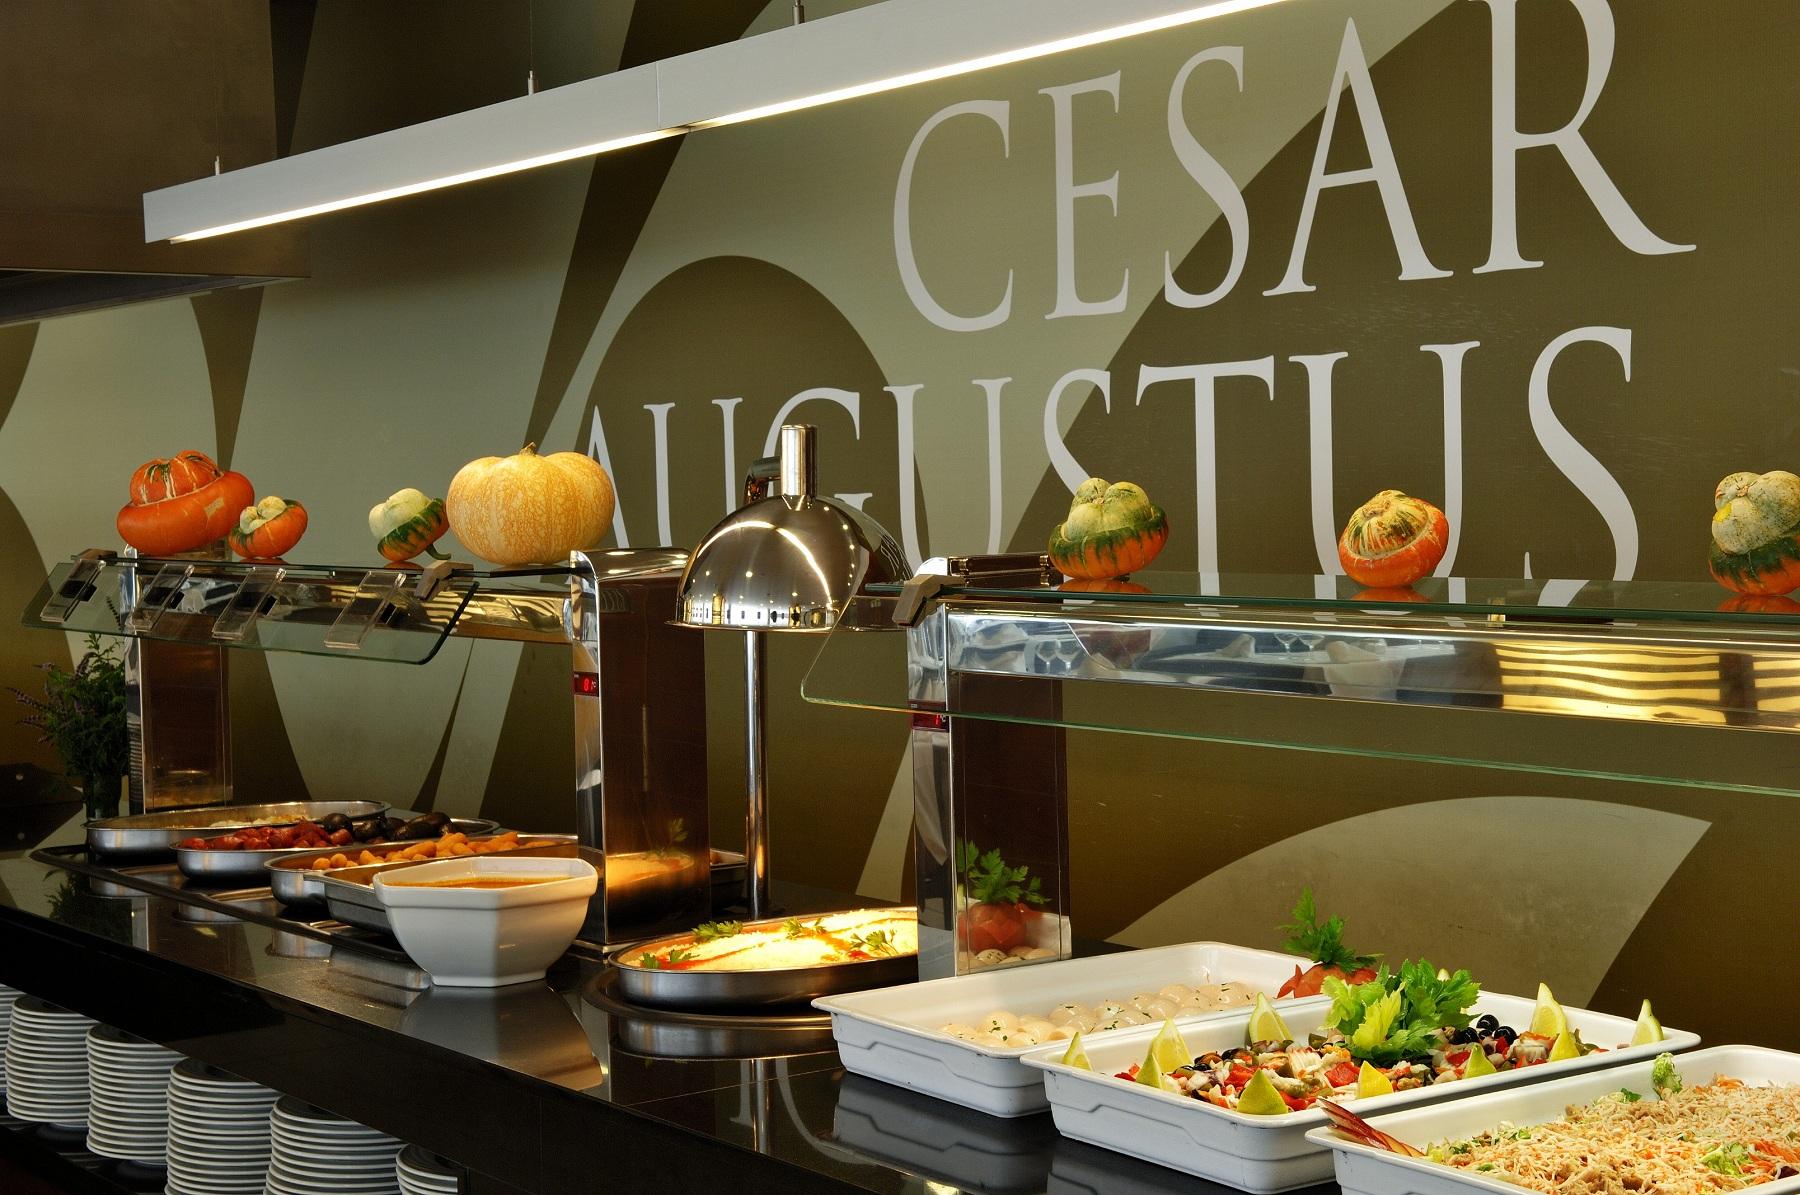 restaurante hotel cesar augustus